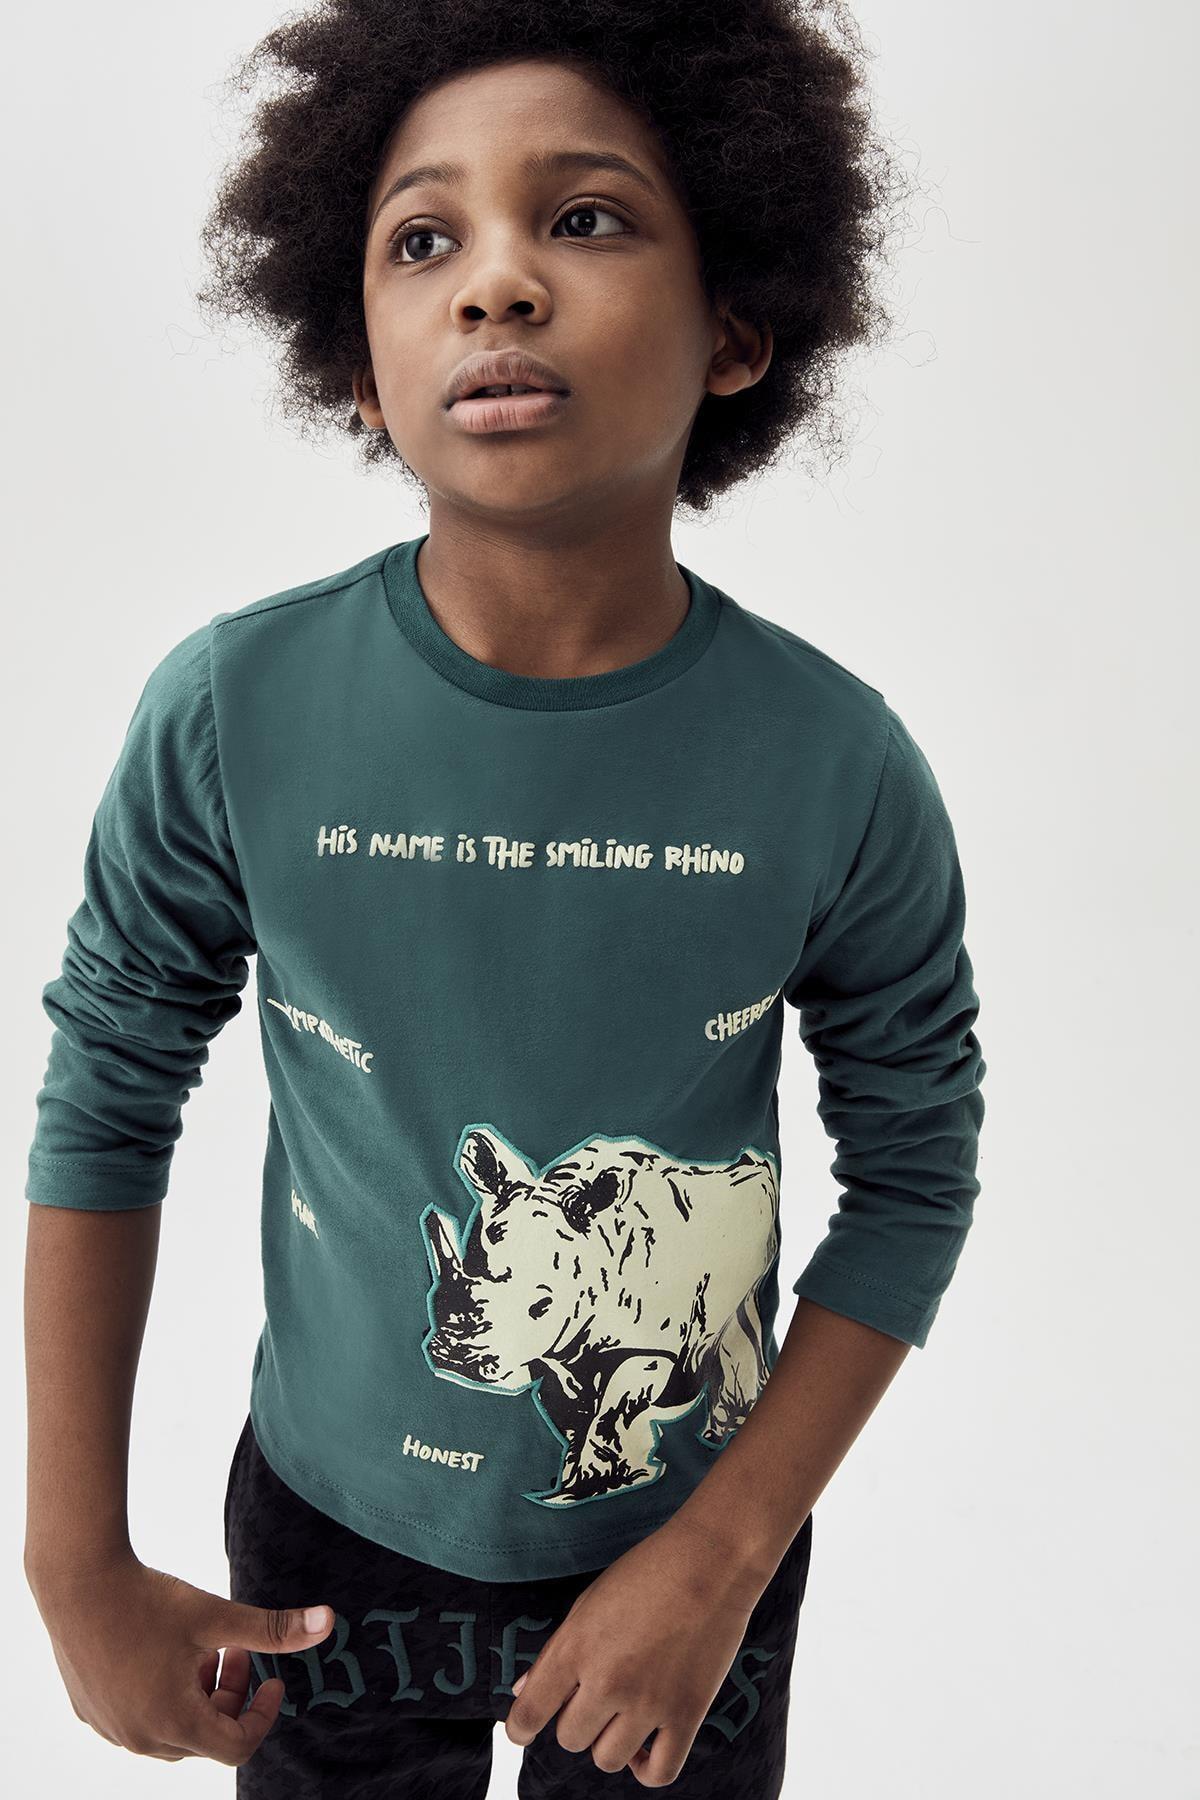 Nebbati Erkek Çocuk Yeşil T-shirt 20fw0nb3521 1